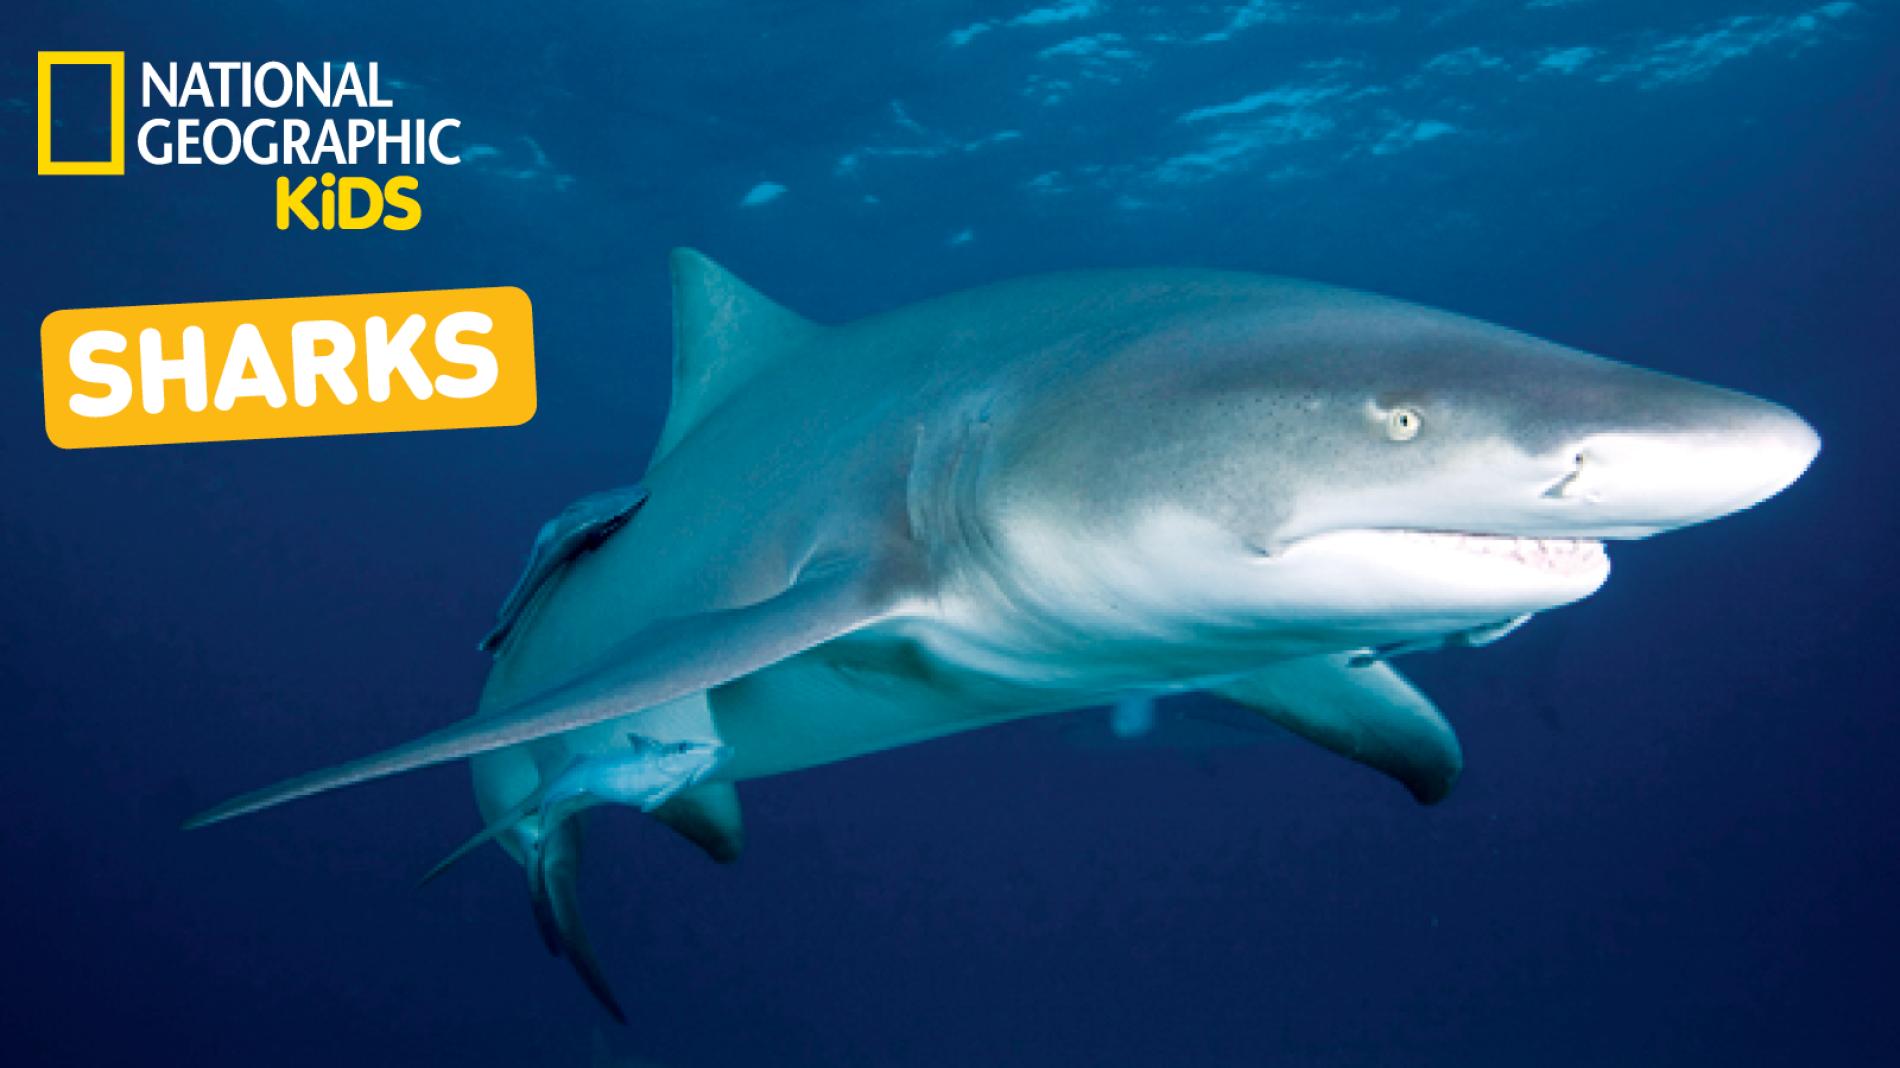 Nat Geo Kids on YouTube: Sharks Playlist